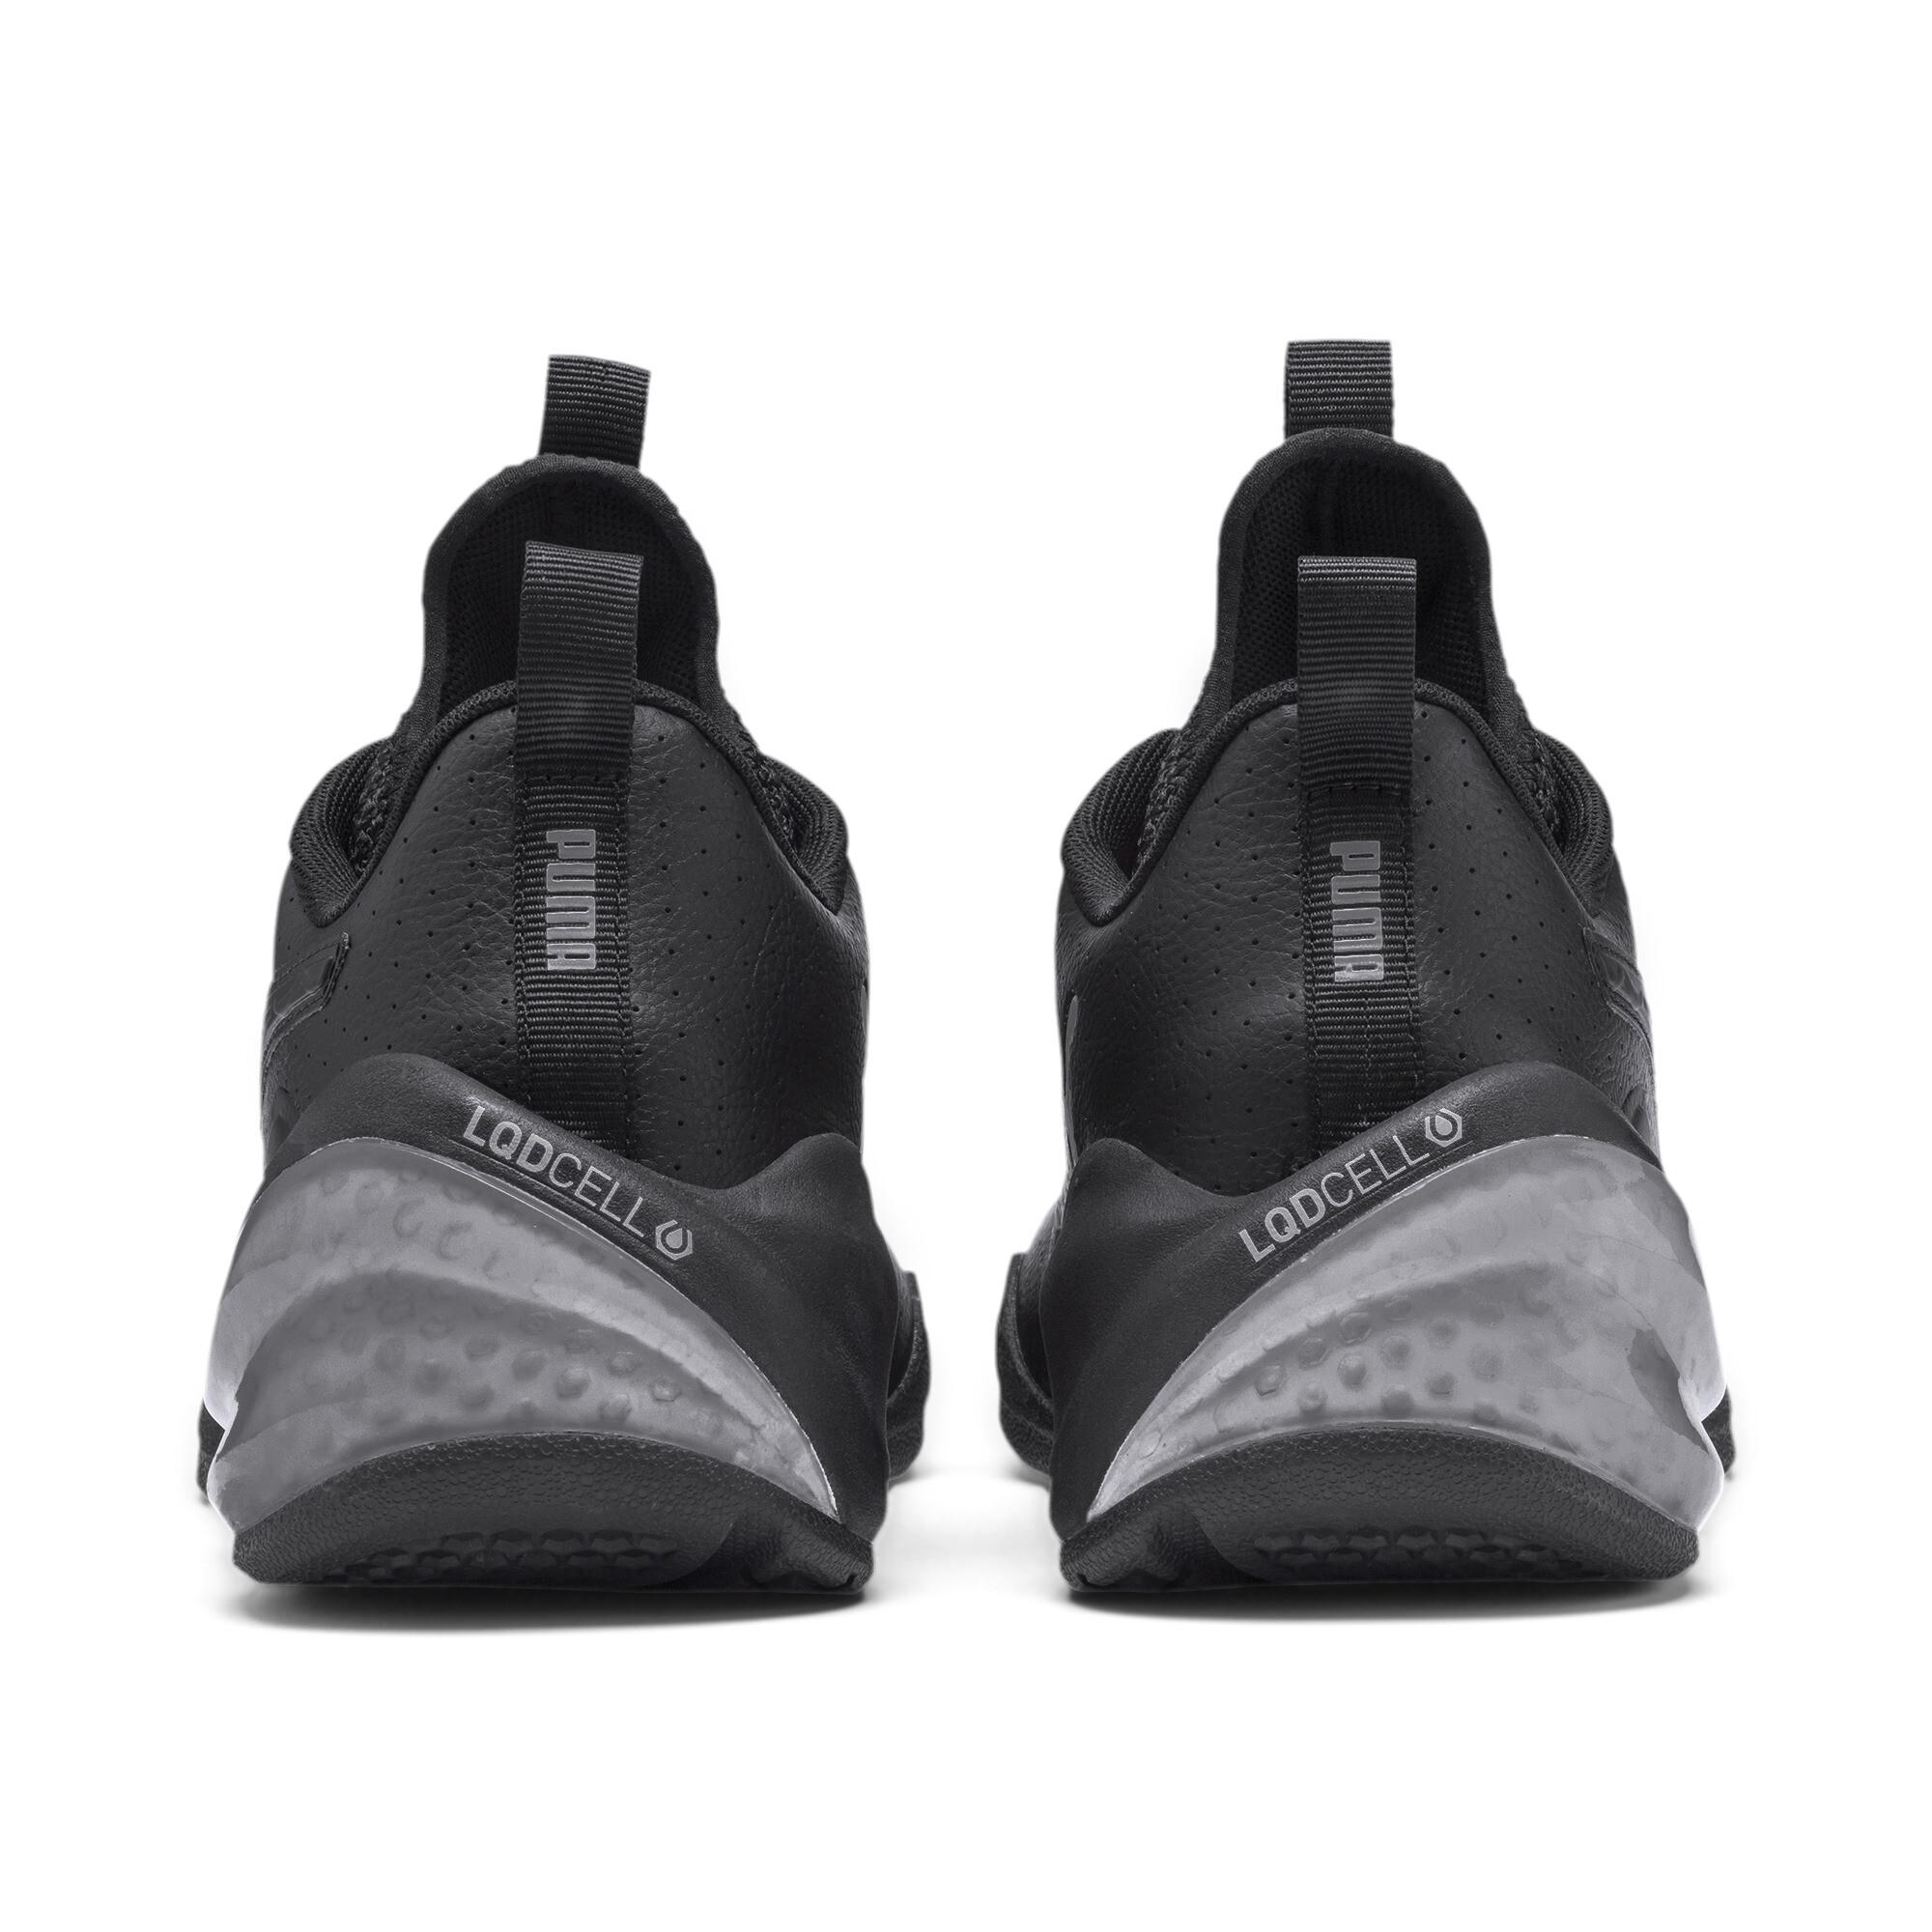 PUMA-Men-039-s-LQDCELL-Challenge-Perf-Training-Shoes thumbnail 10